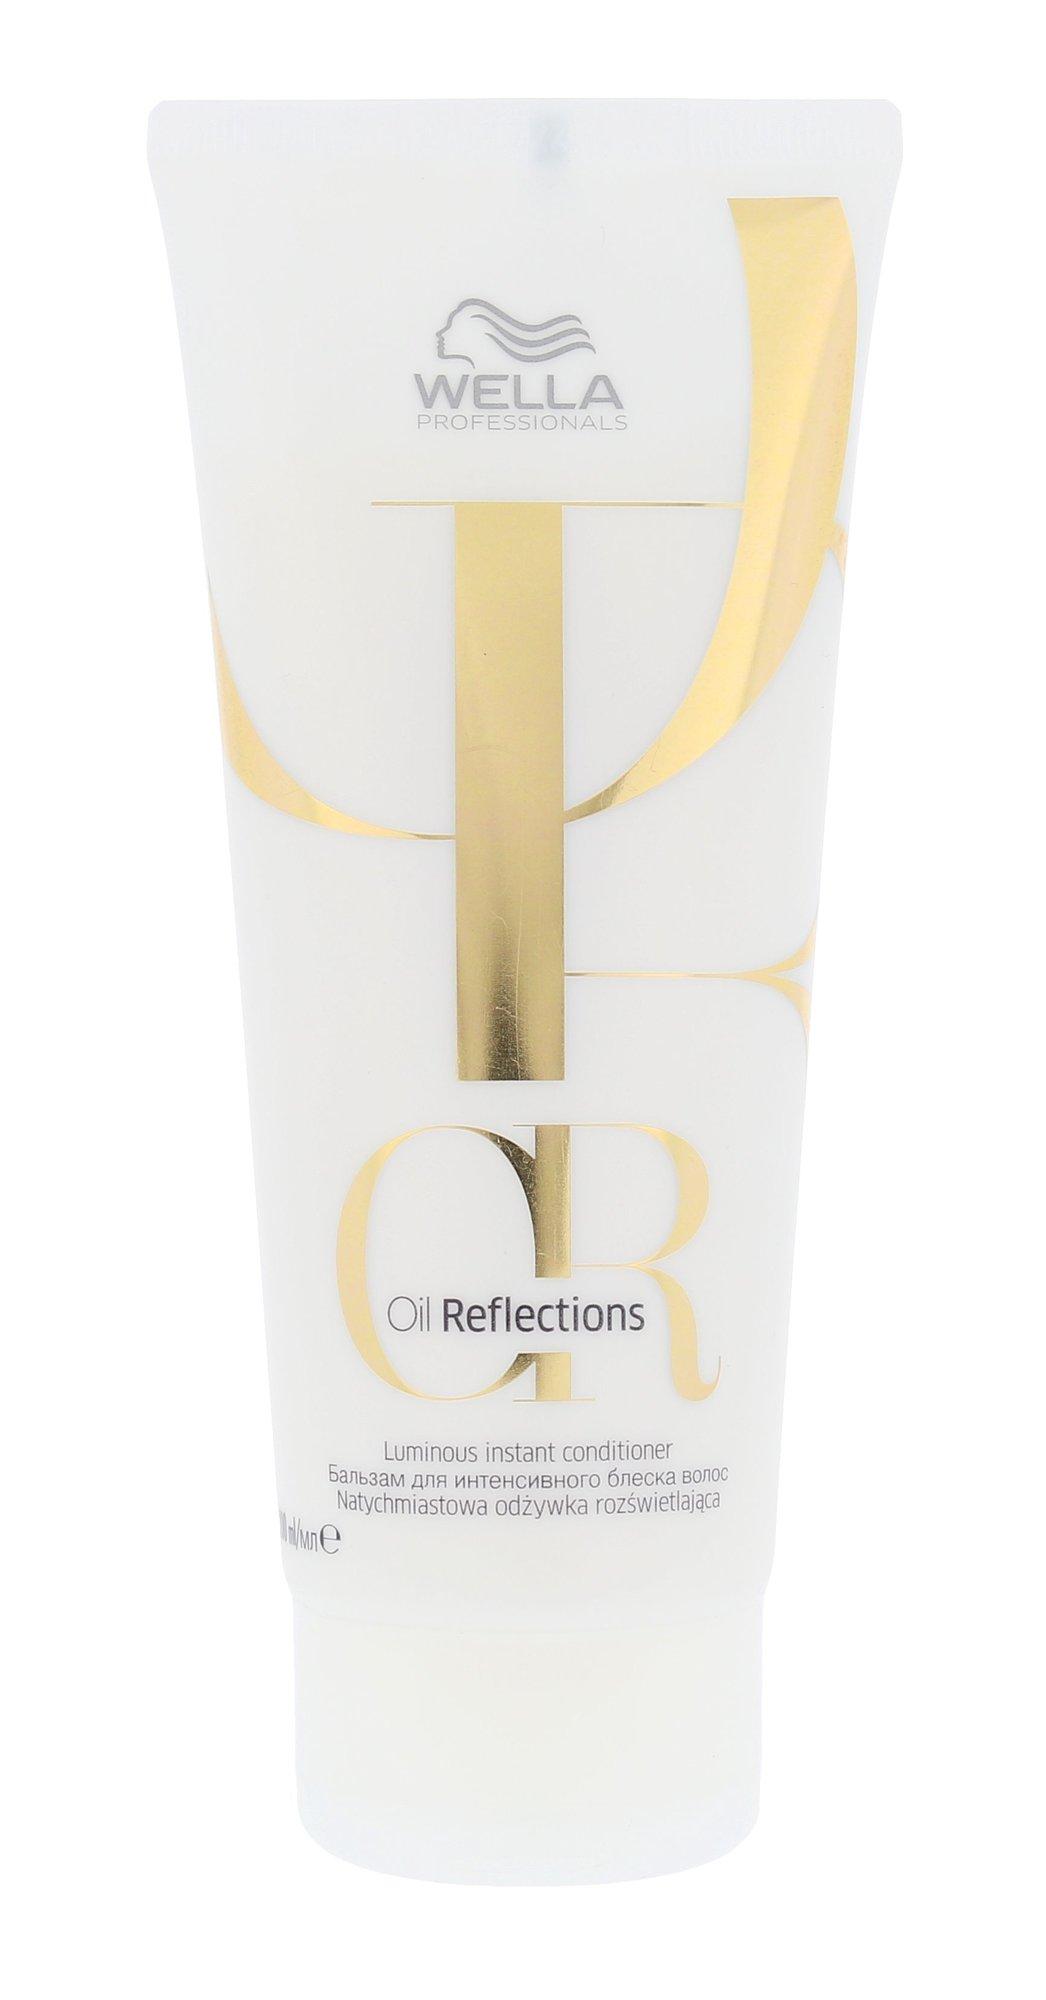 Wella Oil Reflections Cosmetic 200ml